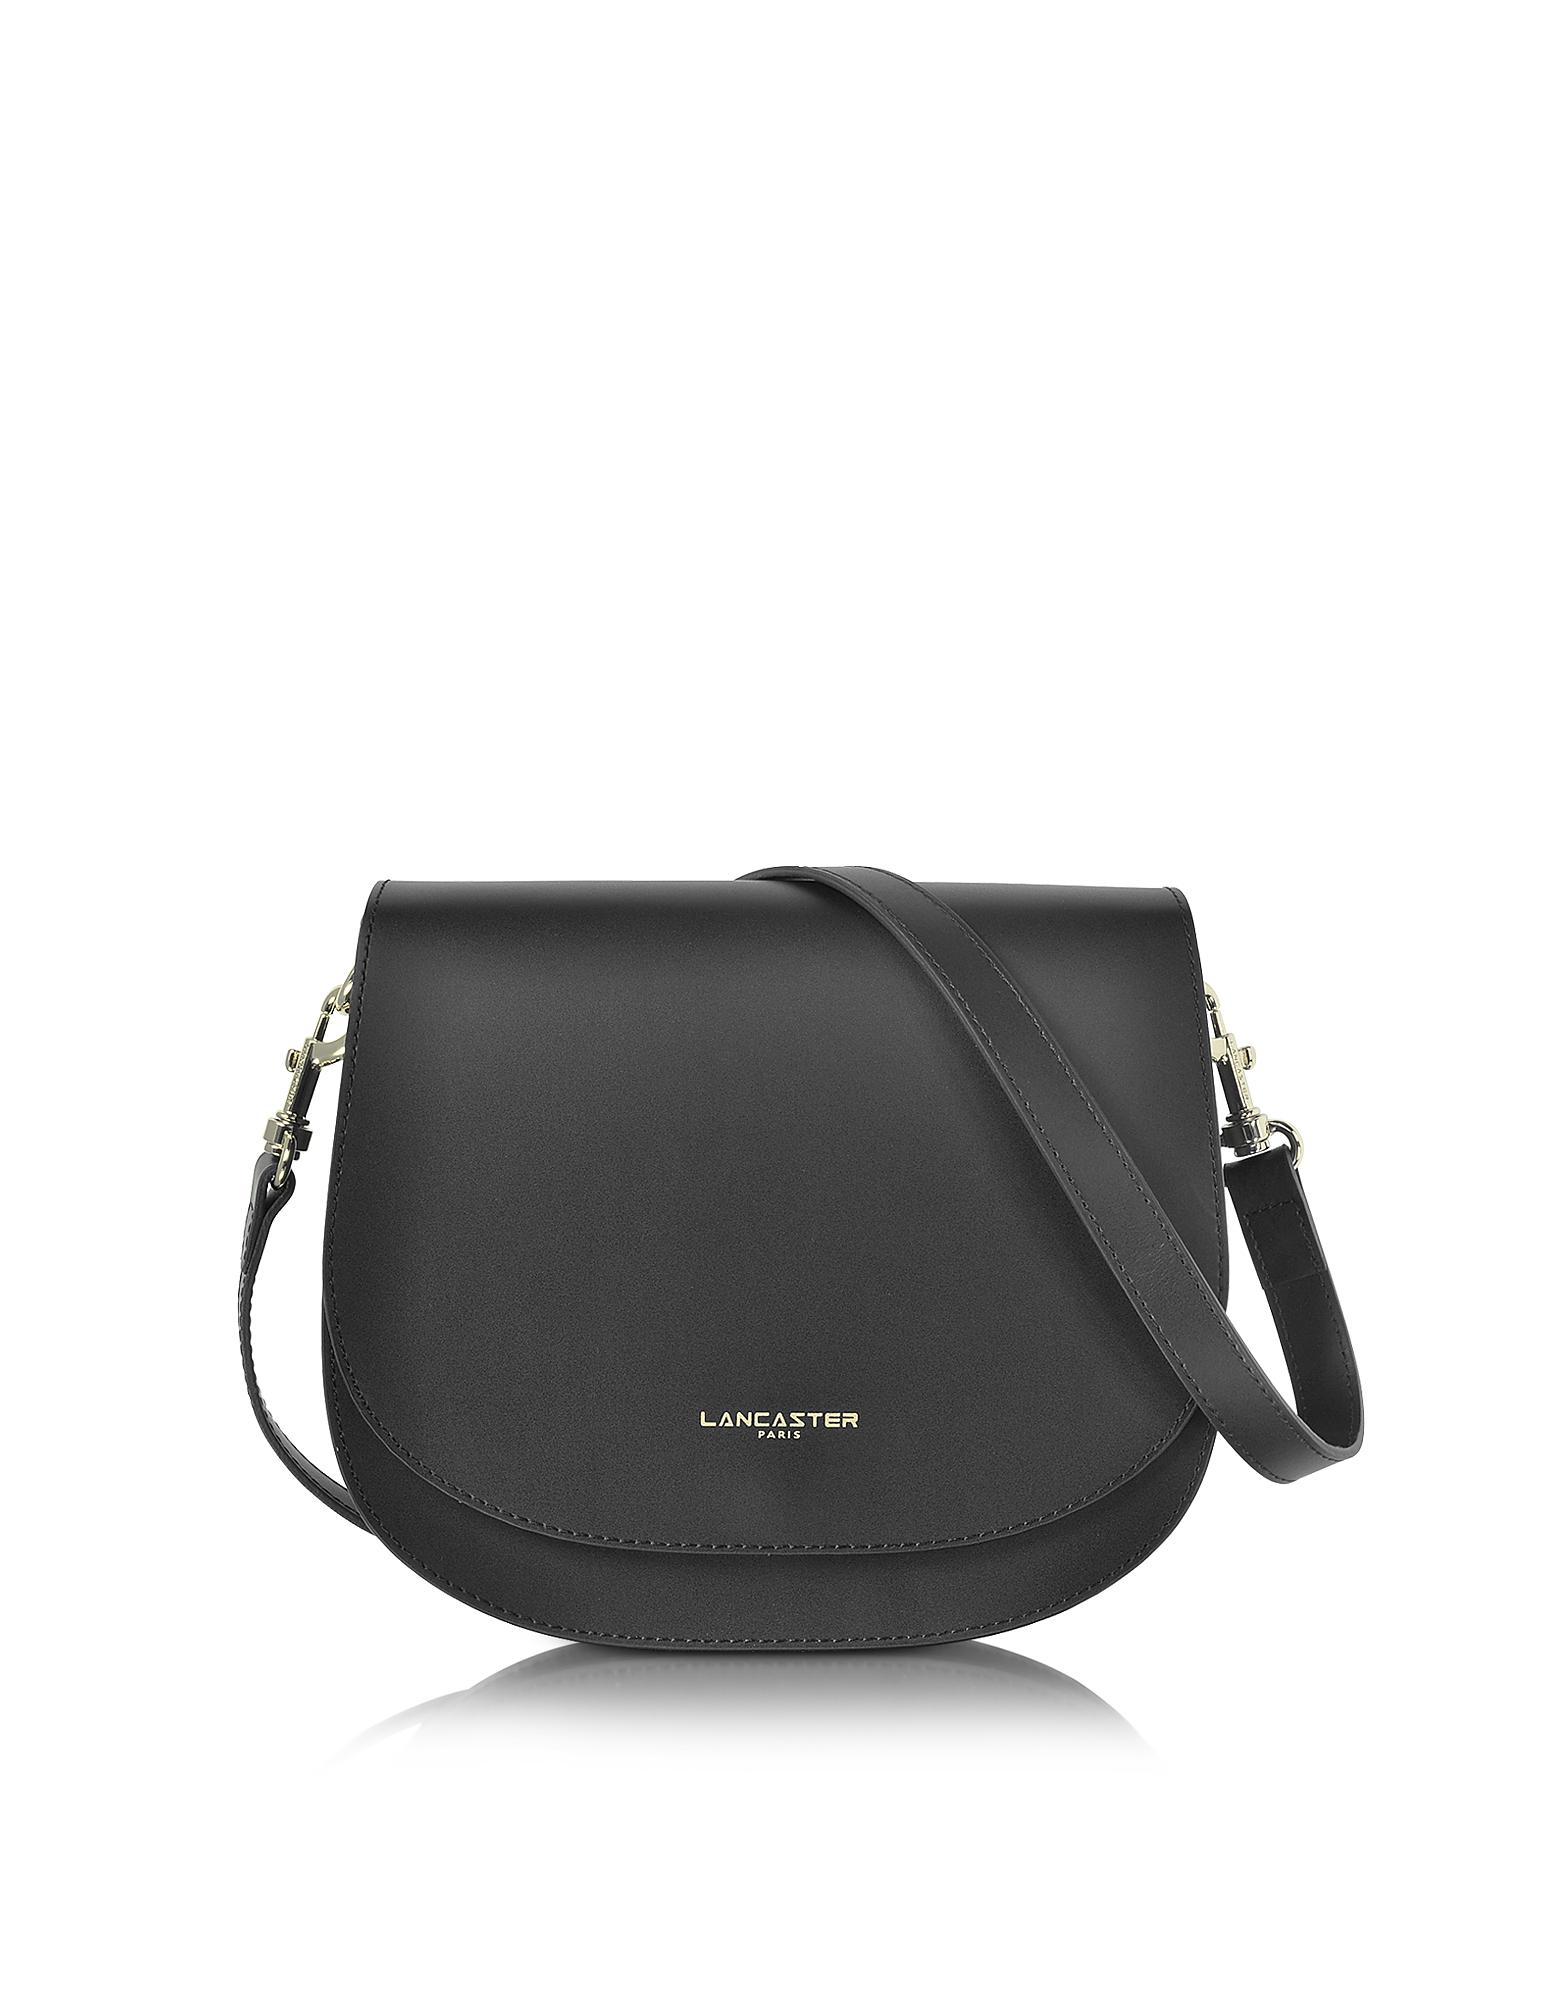 Lancaster Paris Designer Handbags, Camelia Leather Crossbody Bag (Luggage & Bags) photo